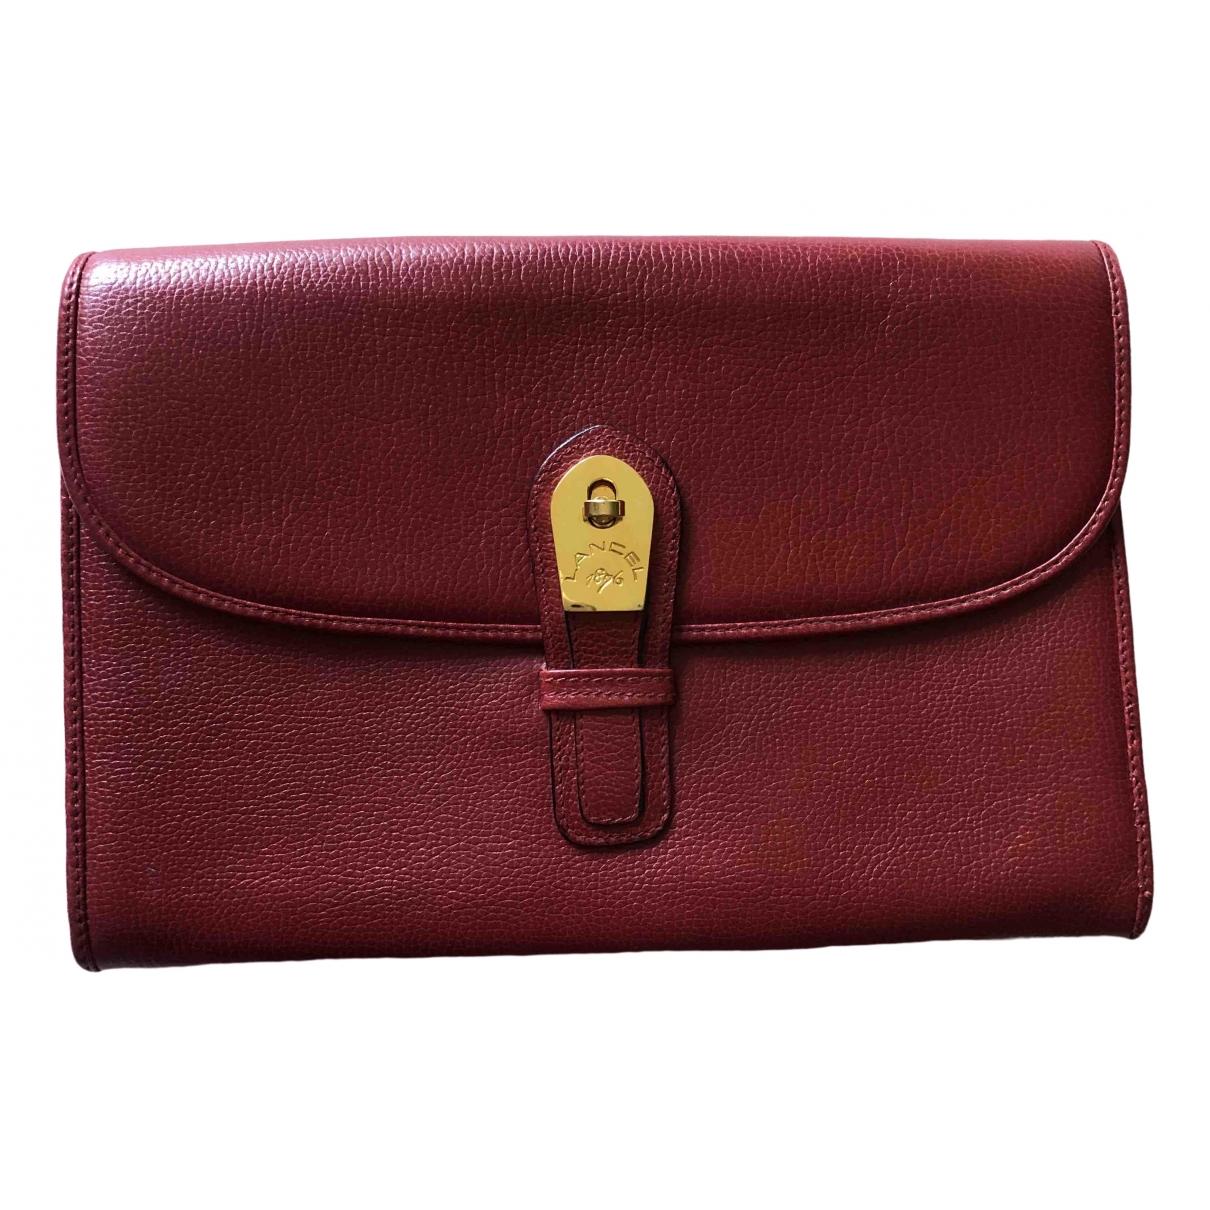 Lancel \N Red Leather Clutch bag for Women \N